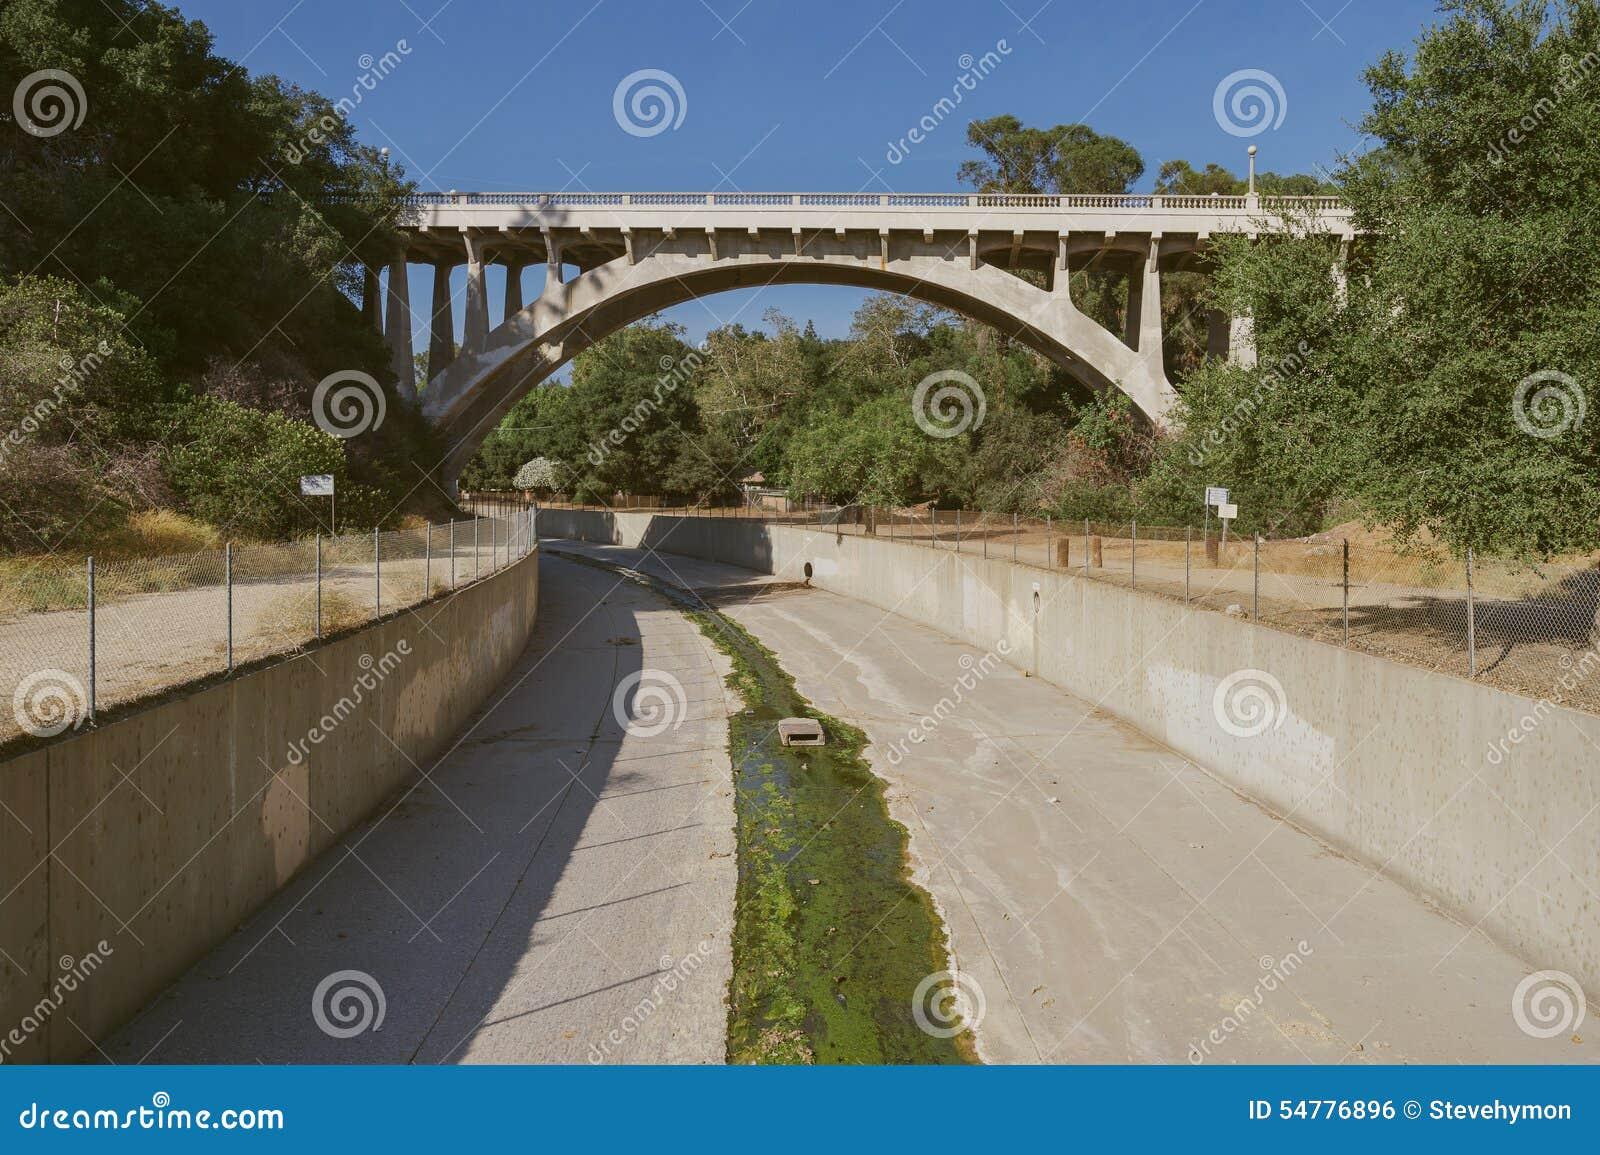 Канал регулирования паводковых вод, Los Angeles County